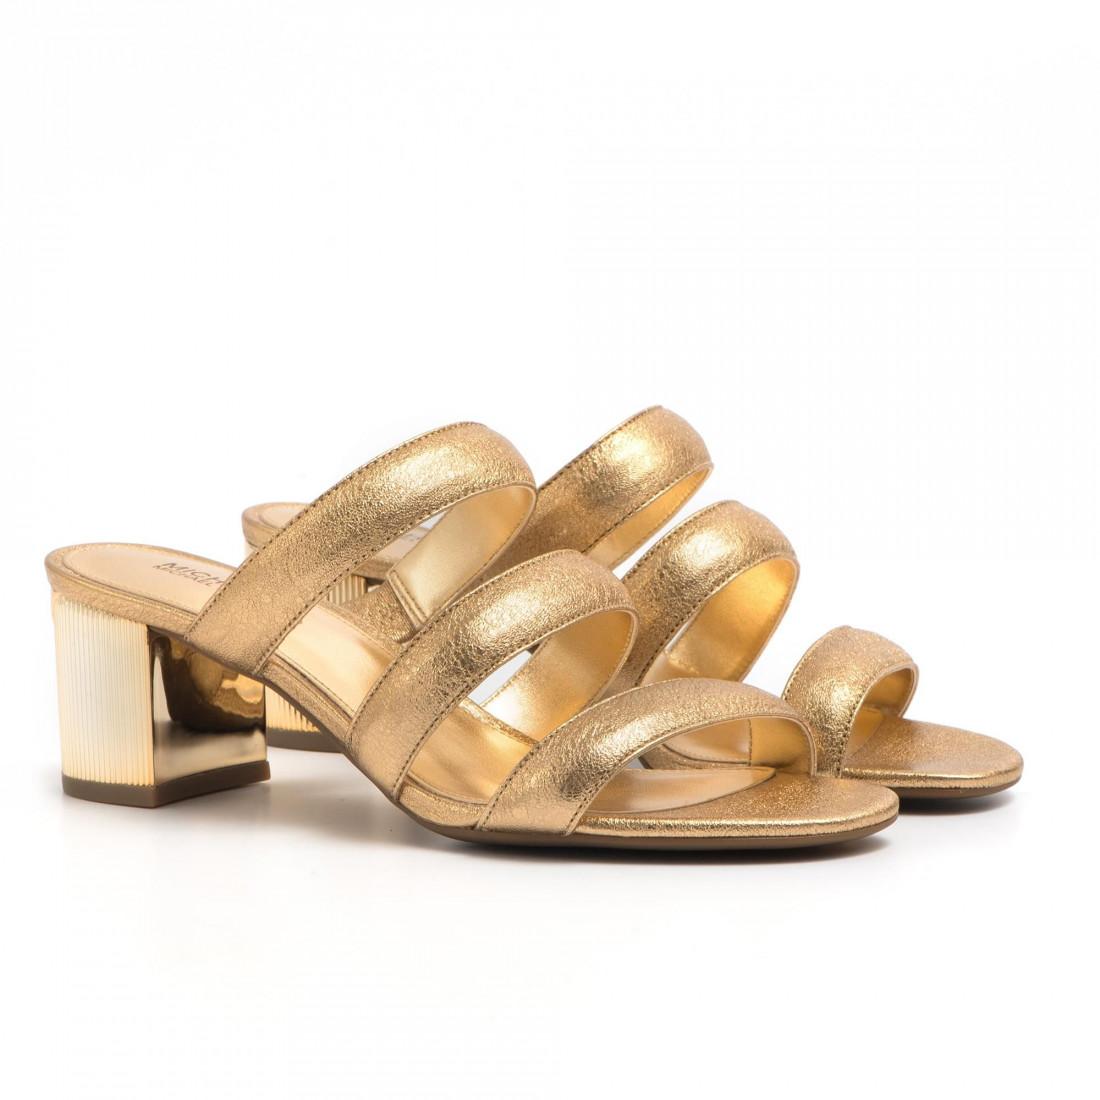 sandals woman michael kors 40s8pamp1m 710 2916